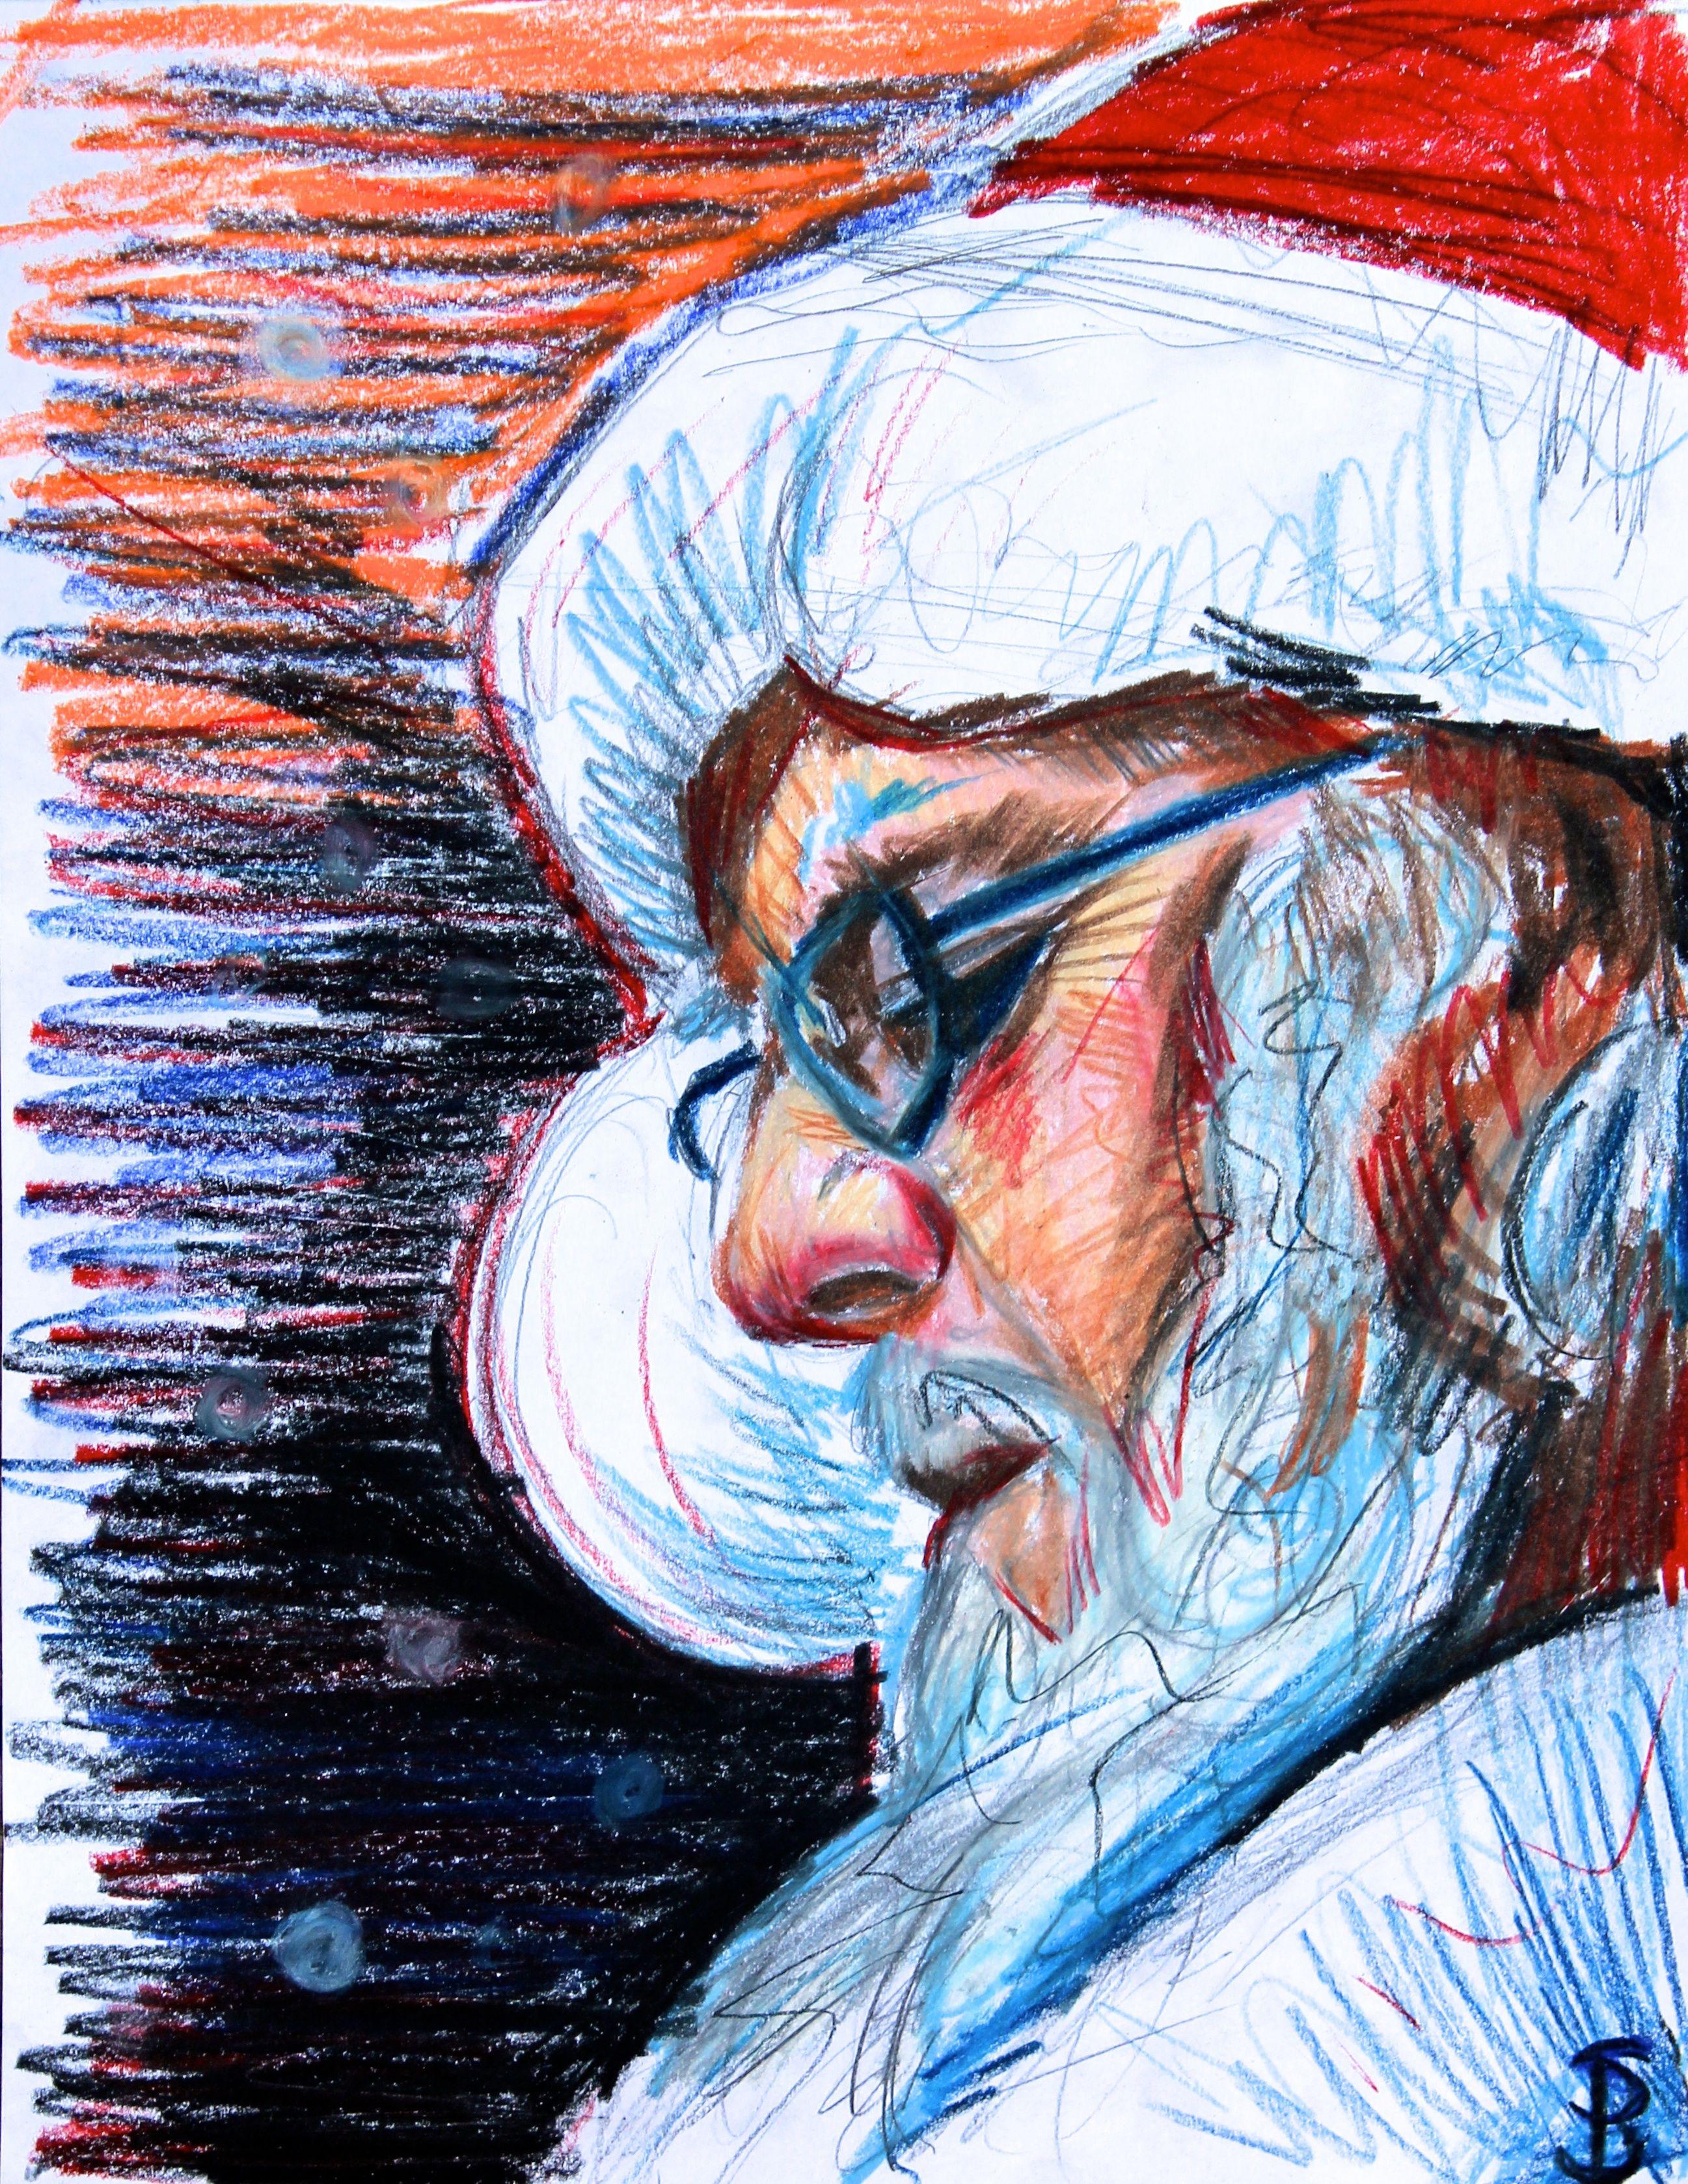 Santa sketch colored pencil drawing by skyler brown